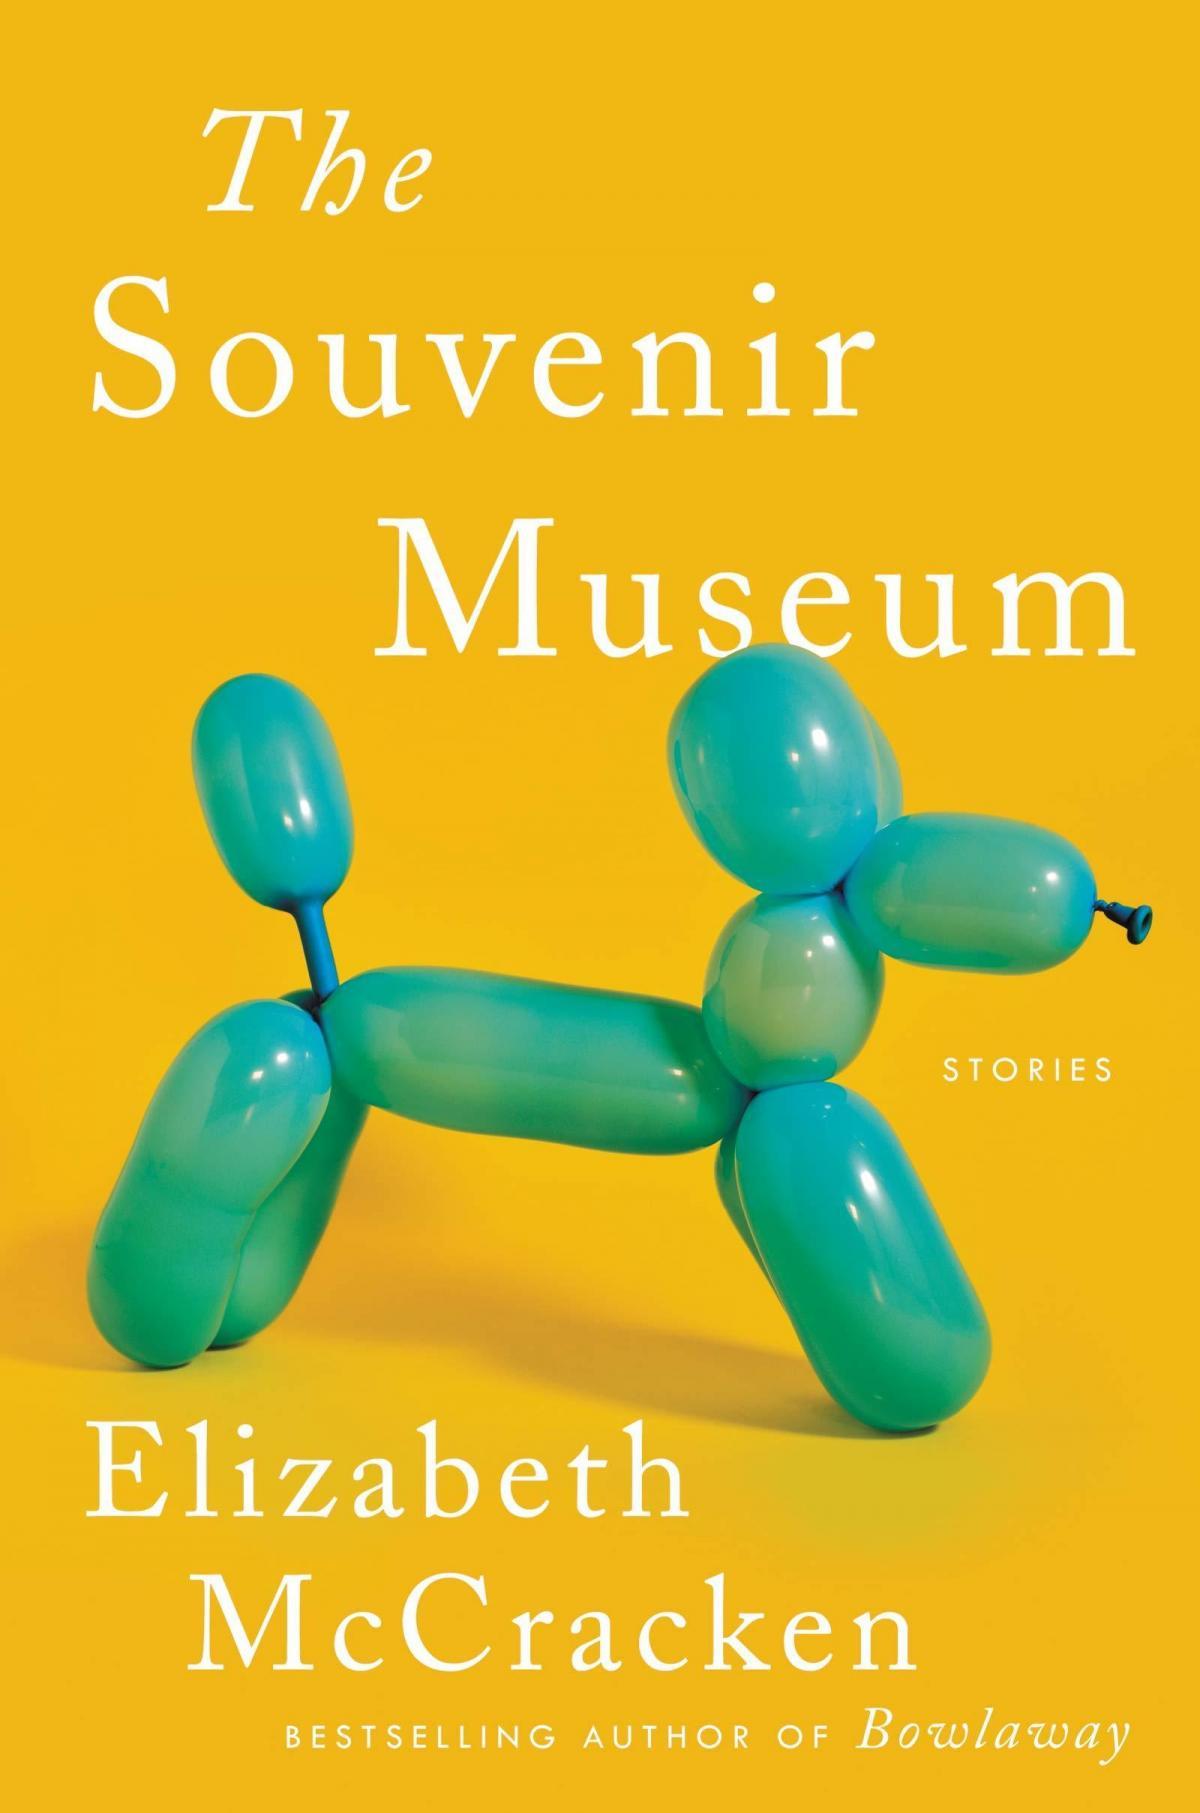 The Souvenir Museum, by Elizabeth McCracken